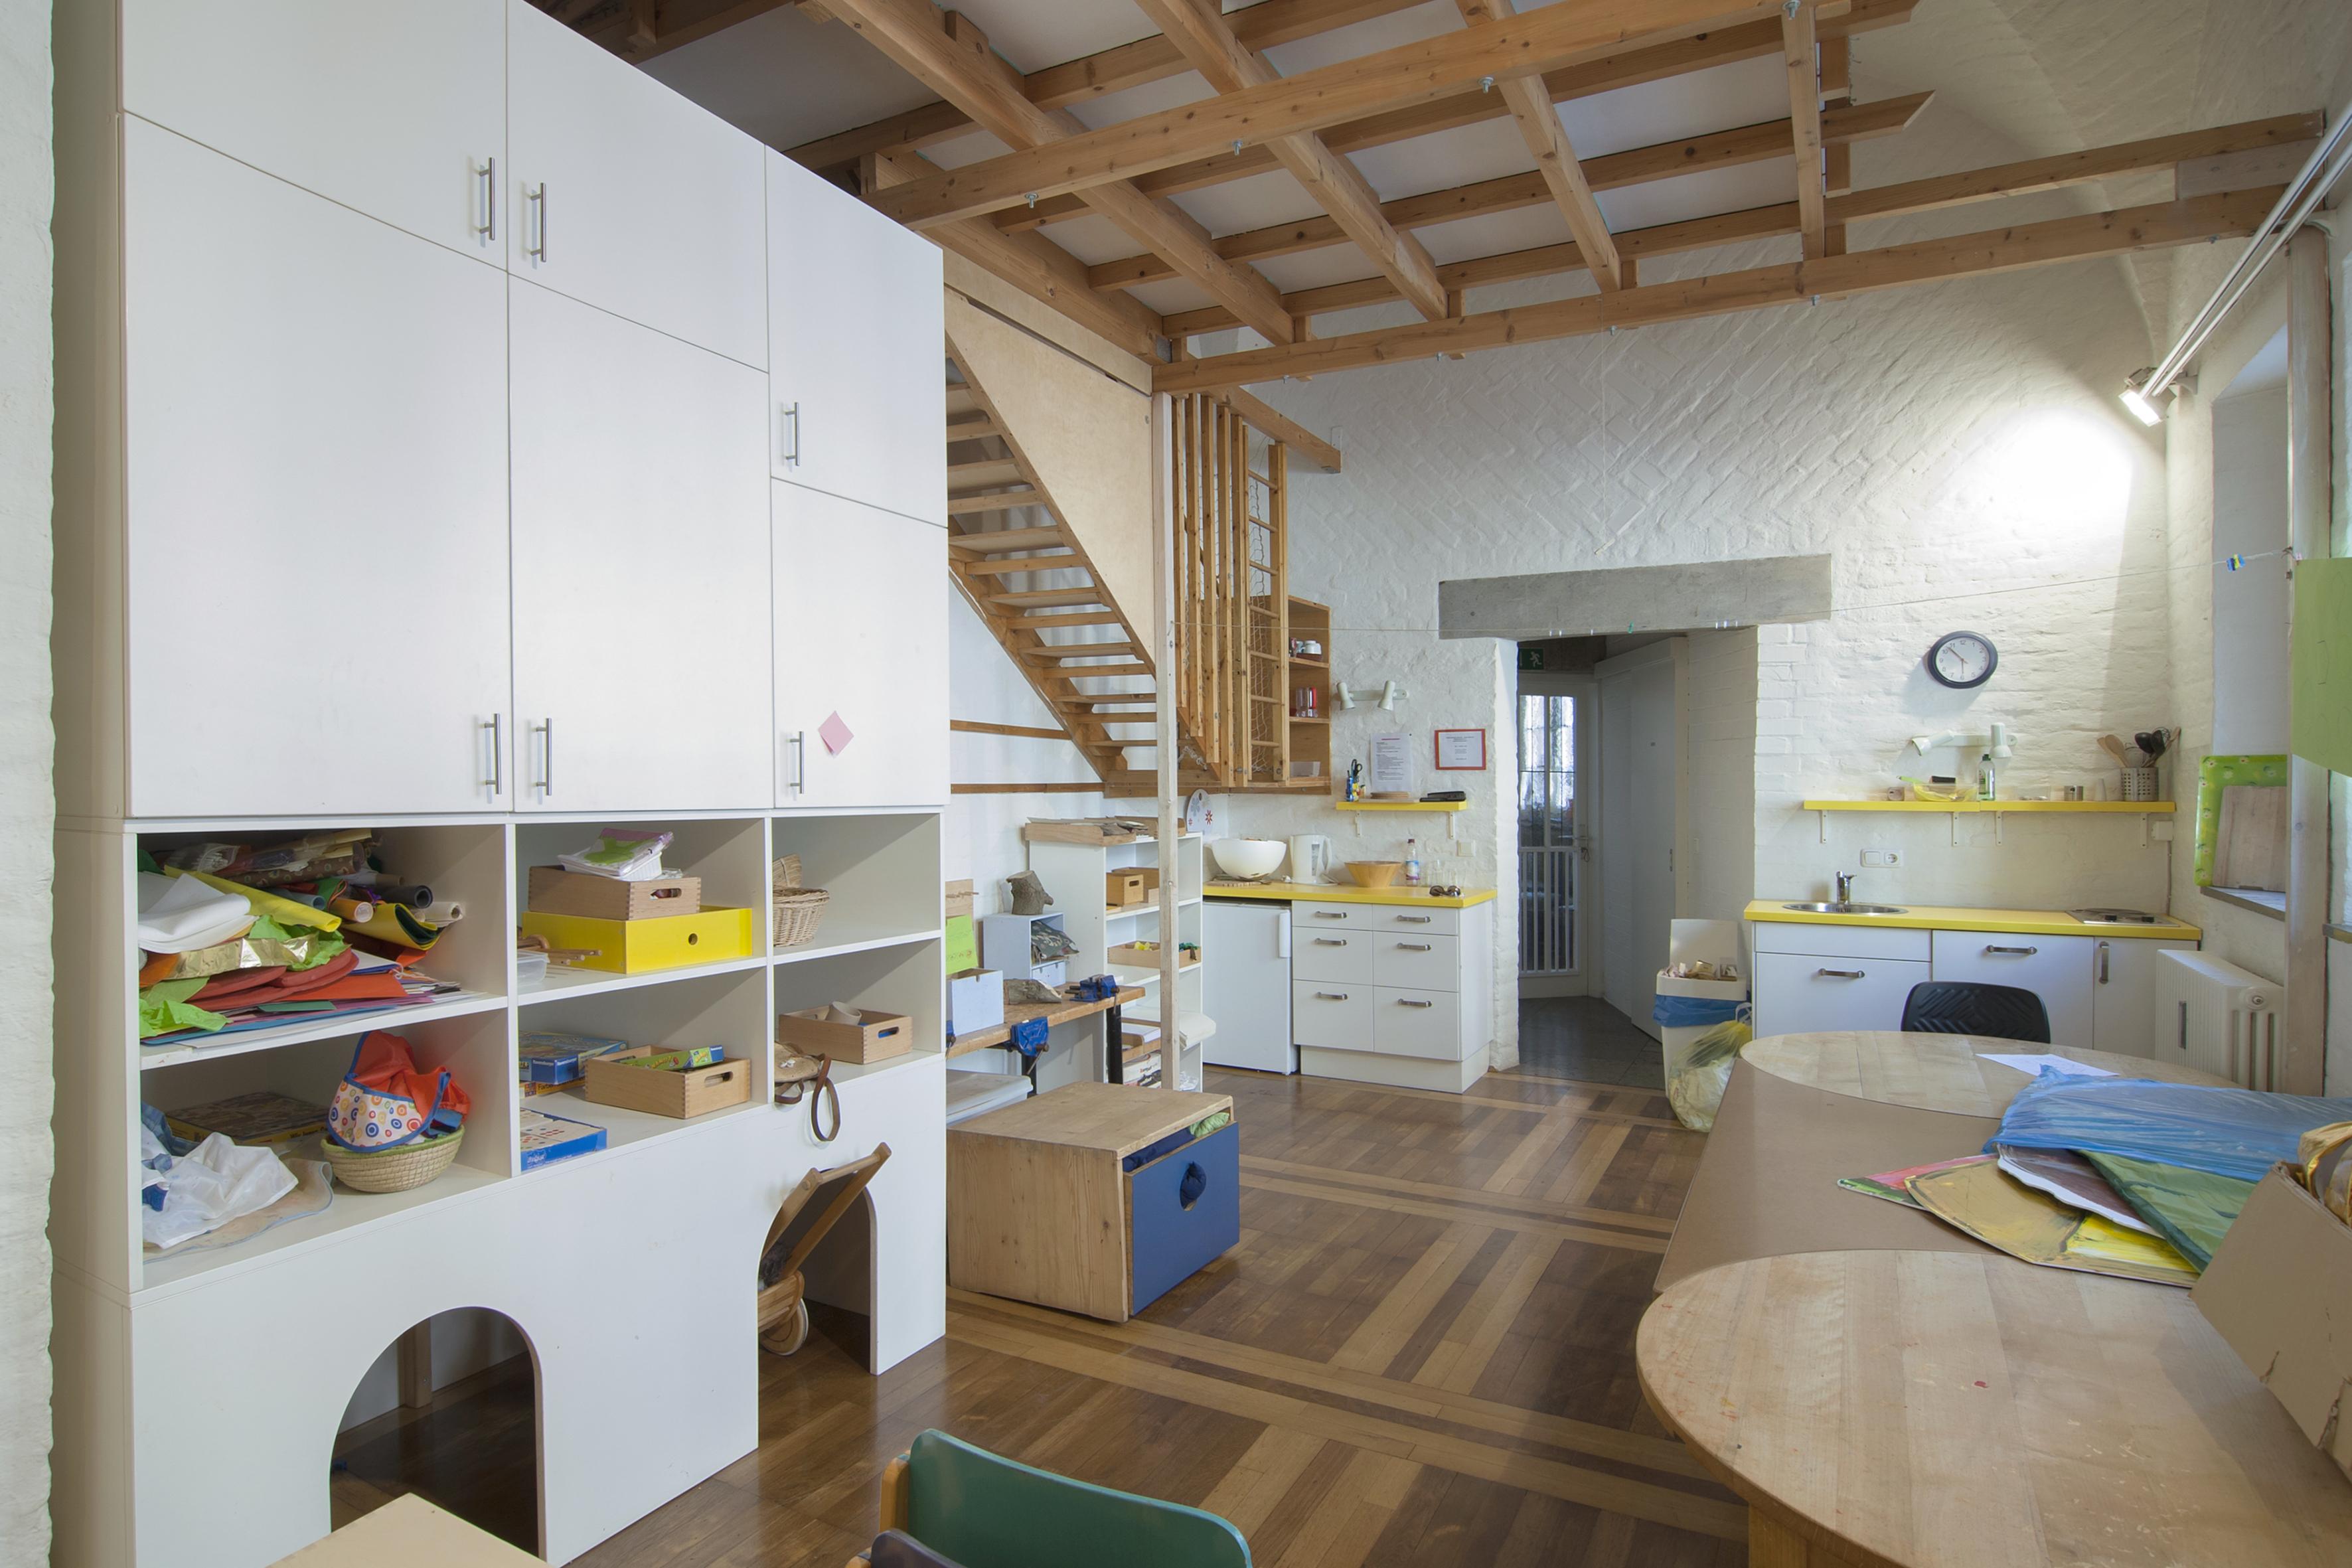 stlukas 10 2014 lehelden e v kindergarten im lehel m nchen. Black Bedroom Furniture Sets. Home Design Ideas